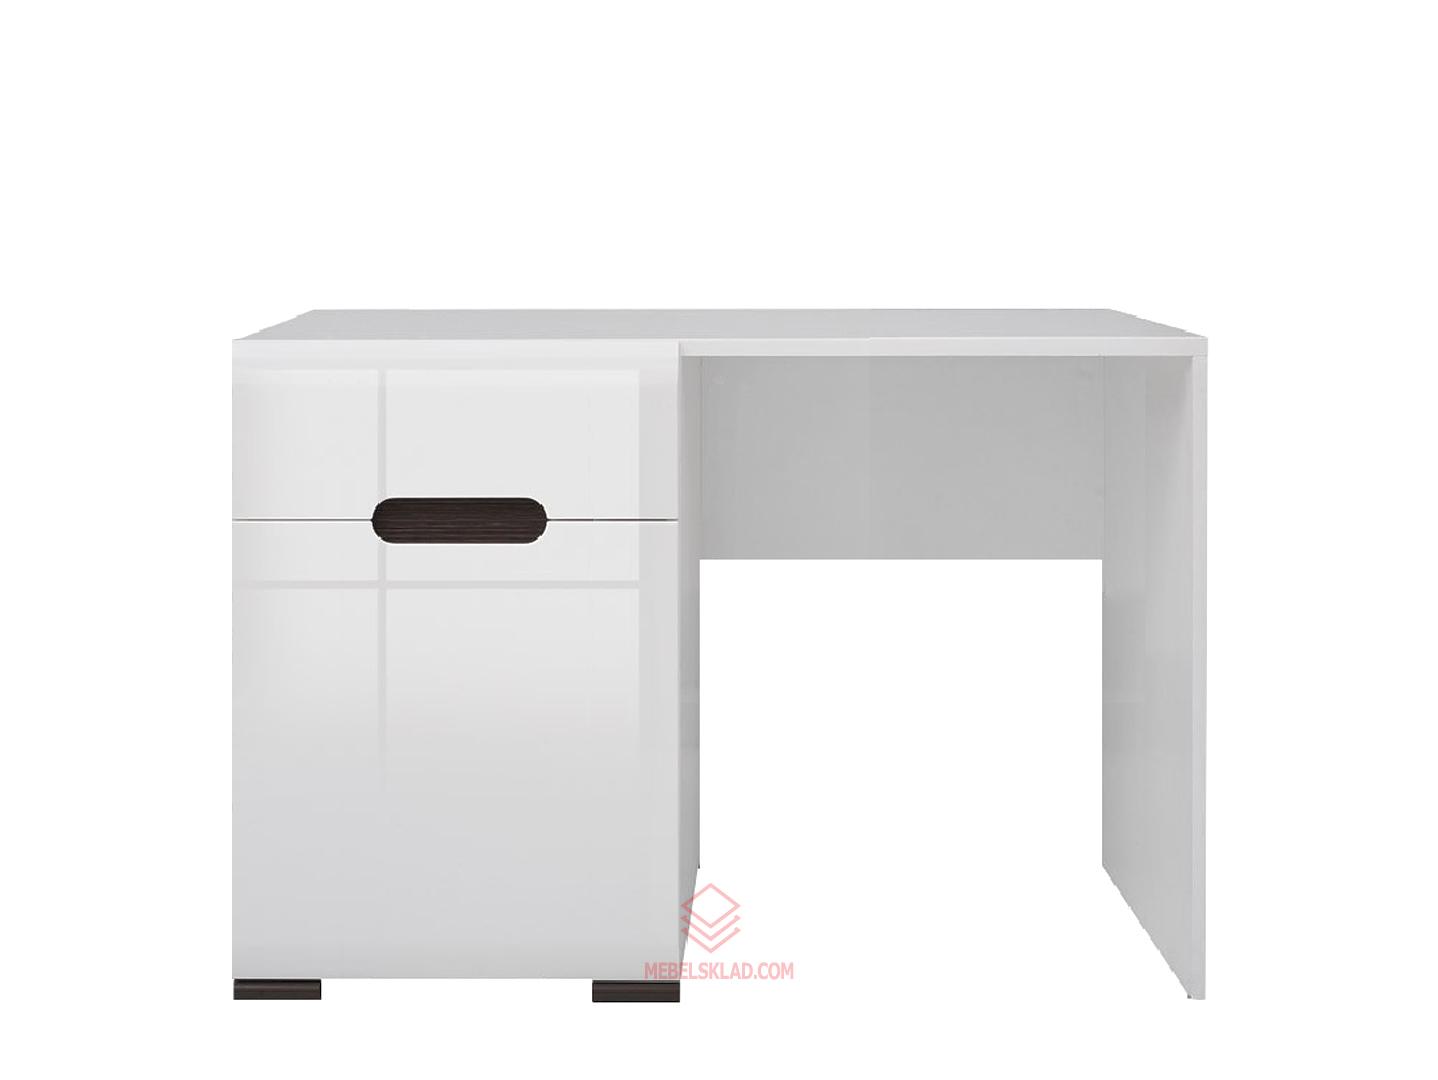 AZTECA туалетный стол TOL1D1S белый за 8474 ₽